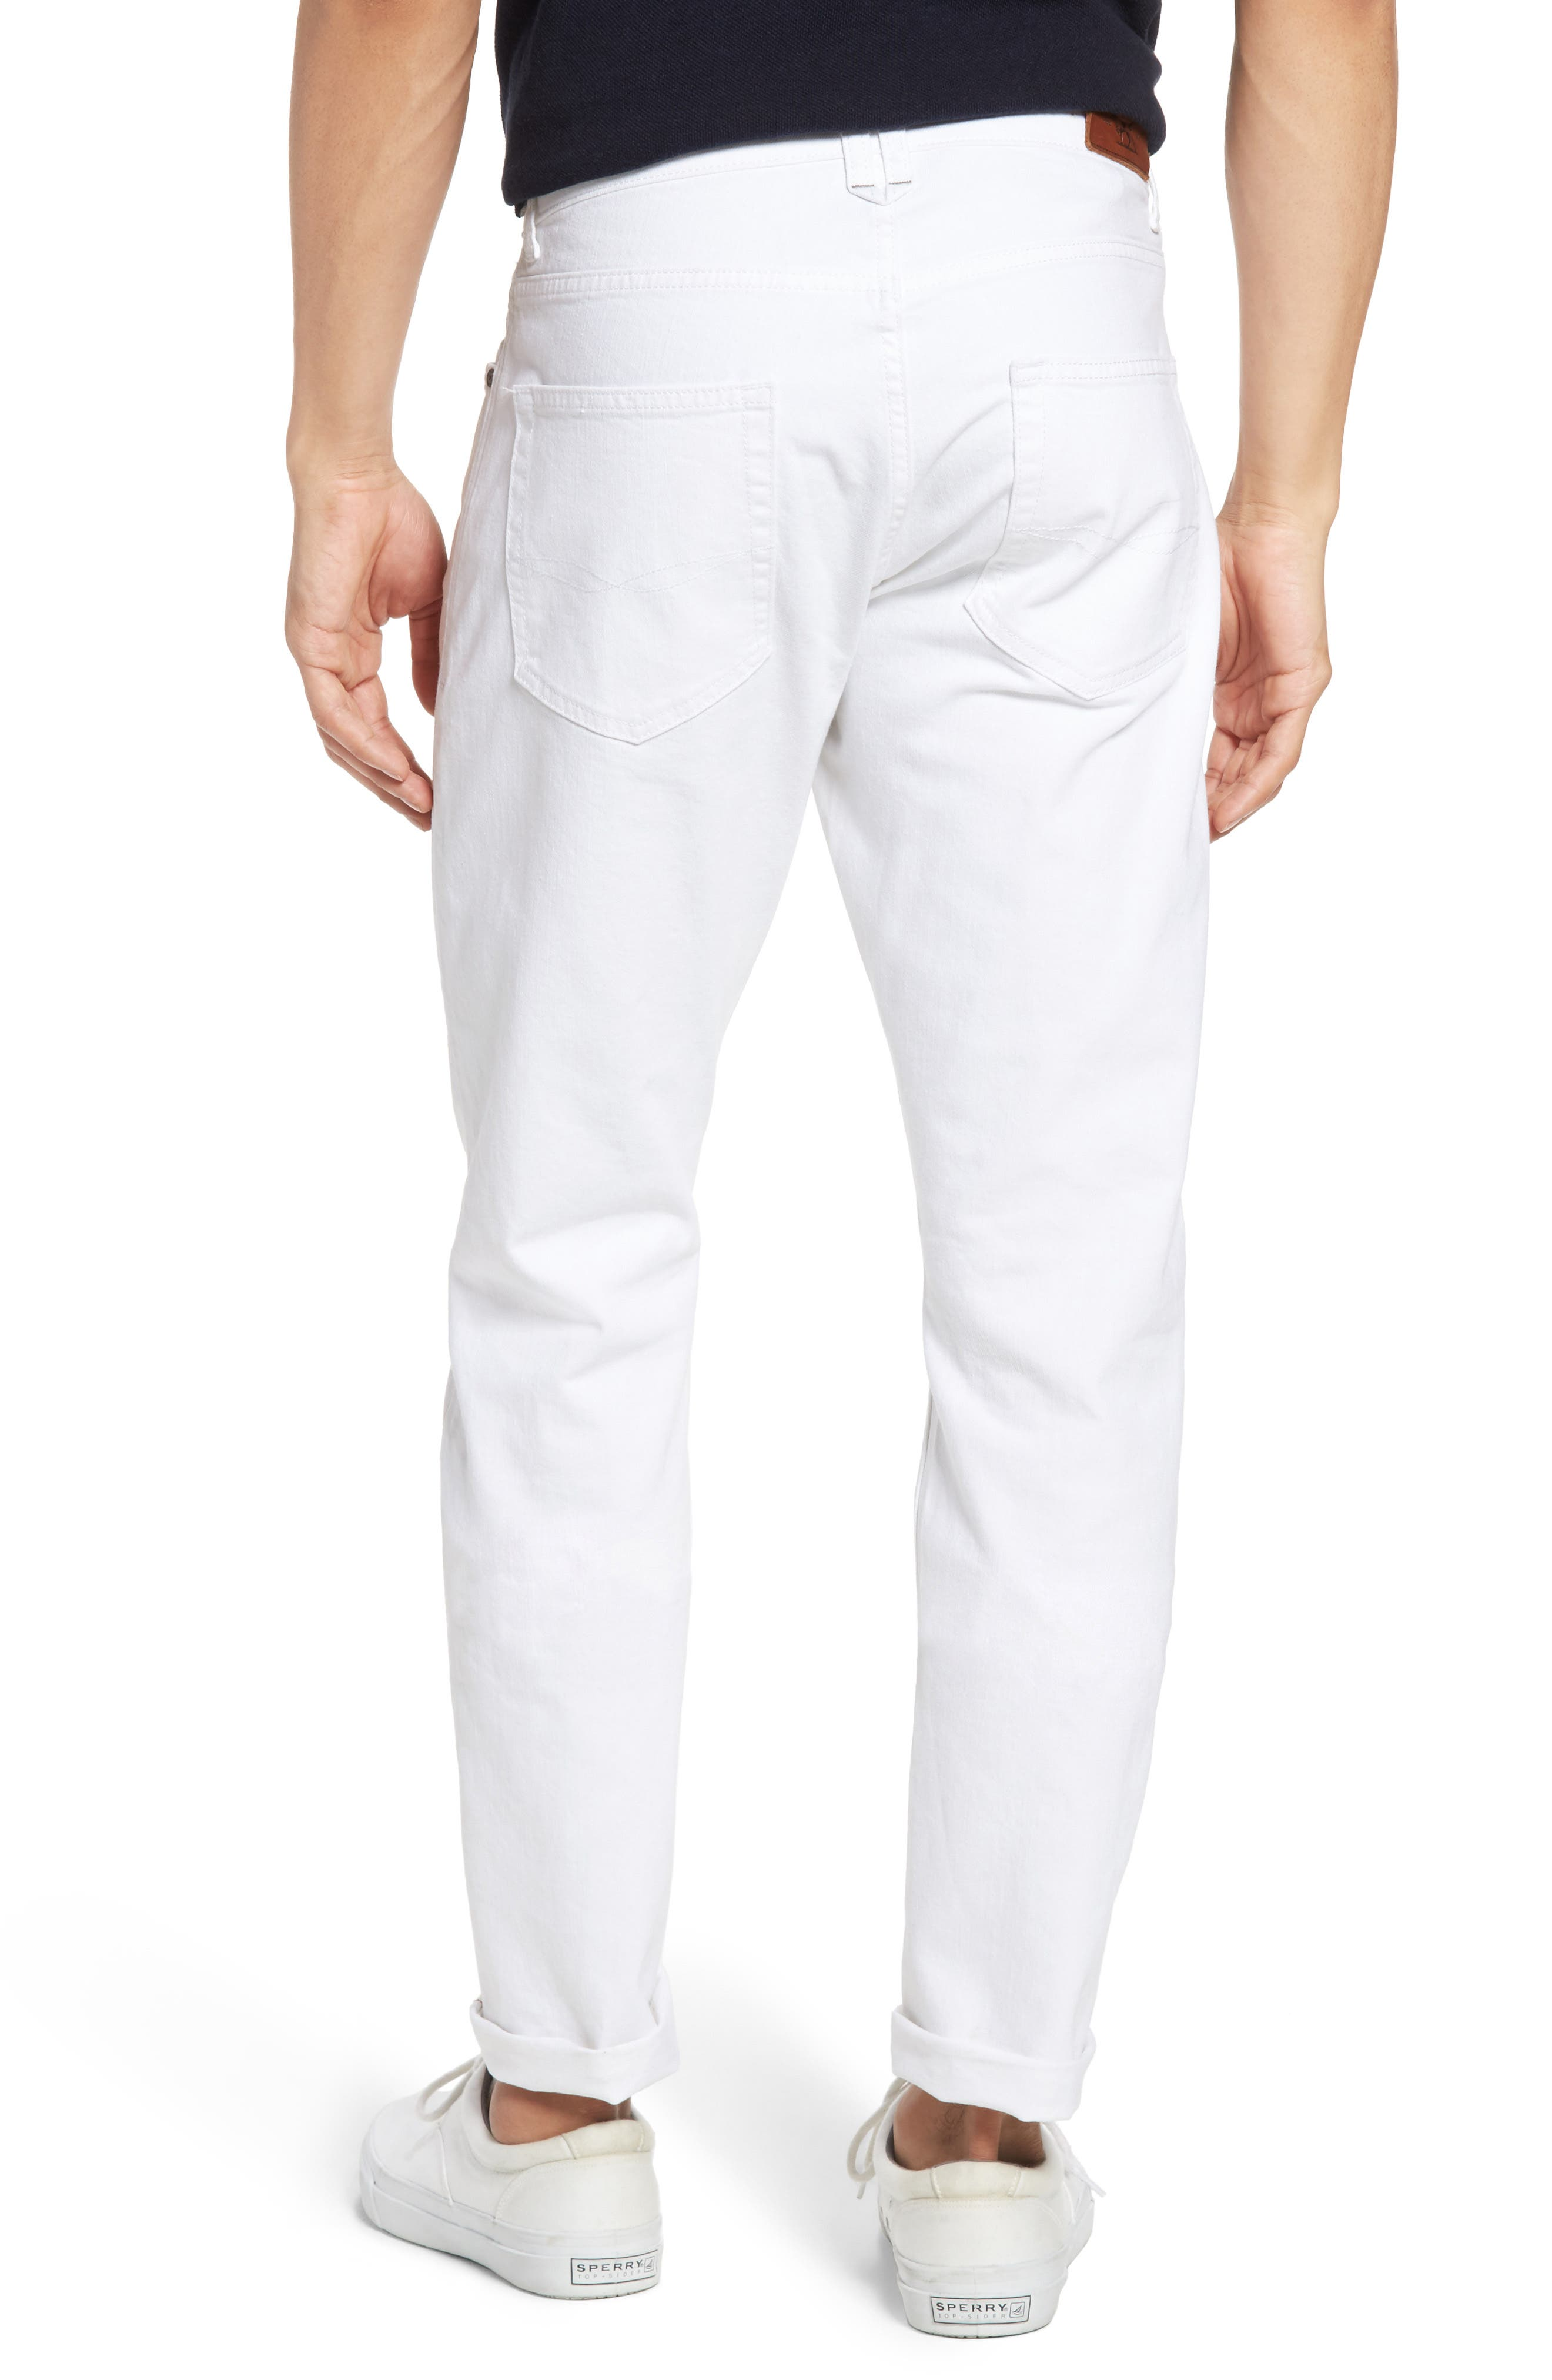 Allemand Straight Leg Jeans,                             Alternate thumbnail 2, color,                             111